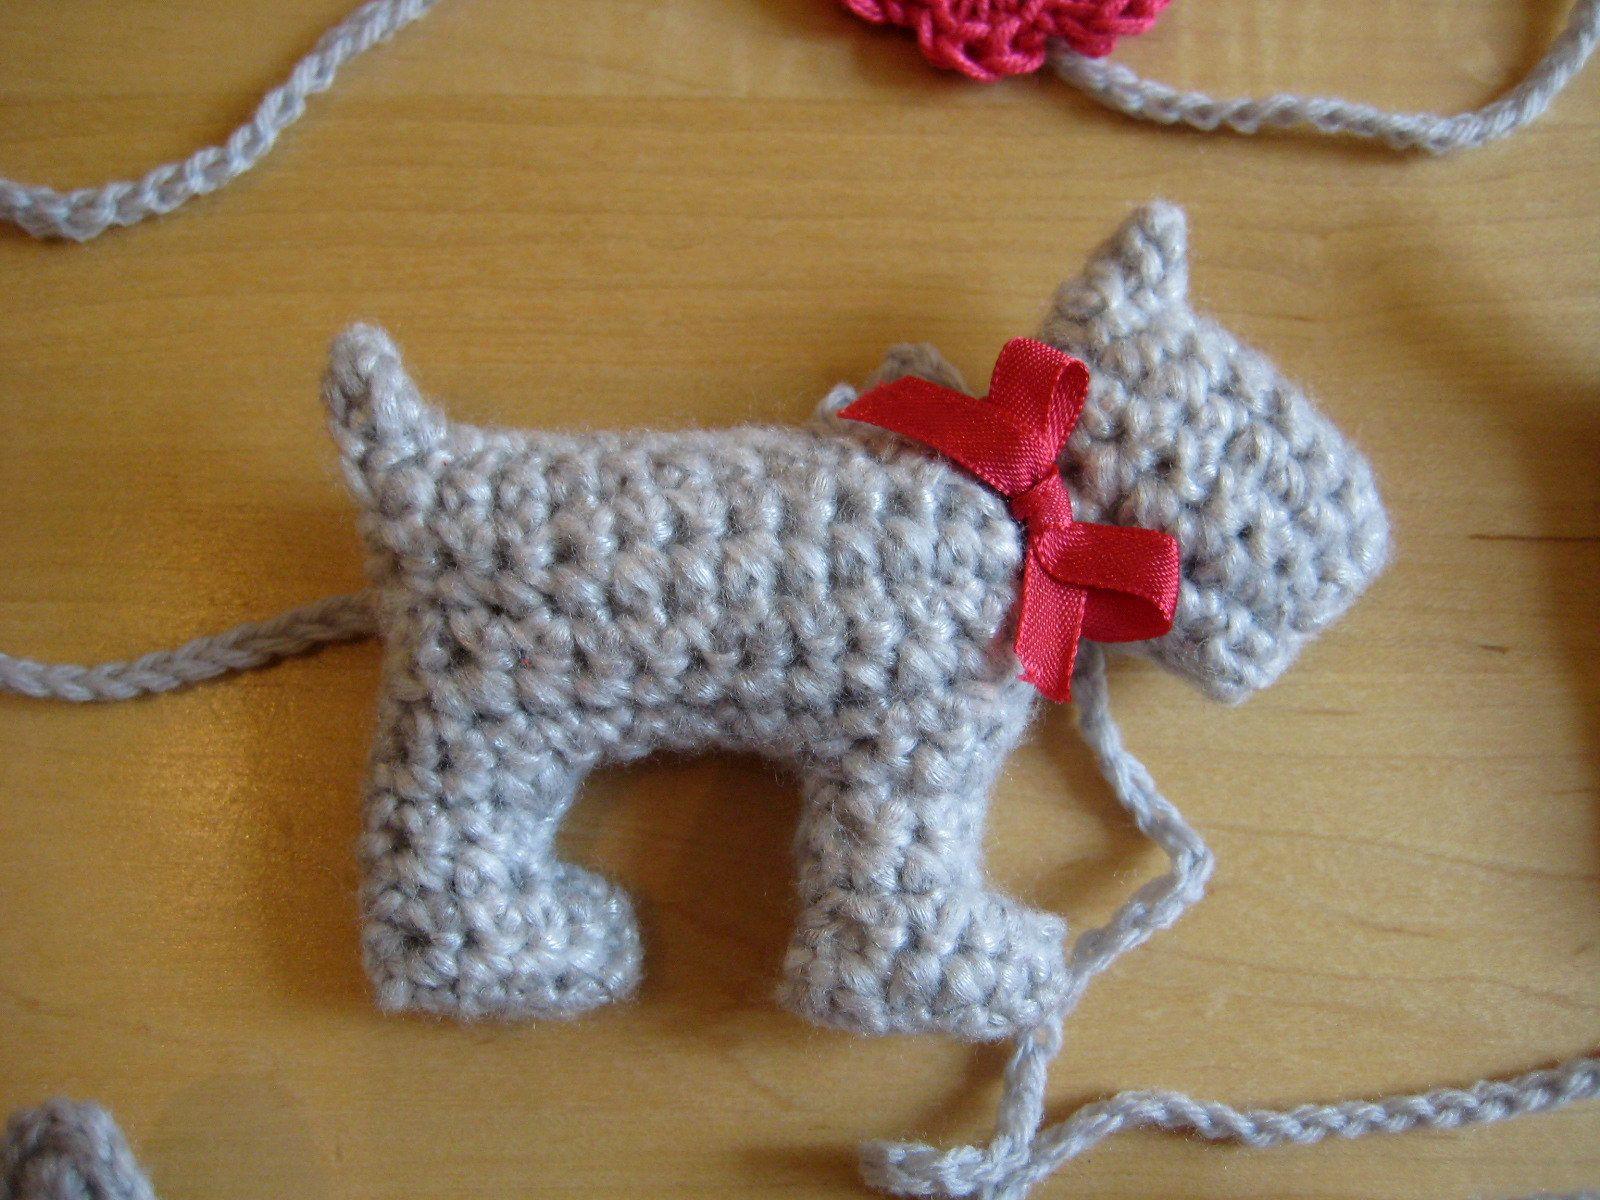 Silver Dog | Amigurumi | Pinterest | Garlands, Dog and Ravelry